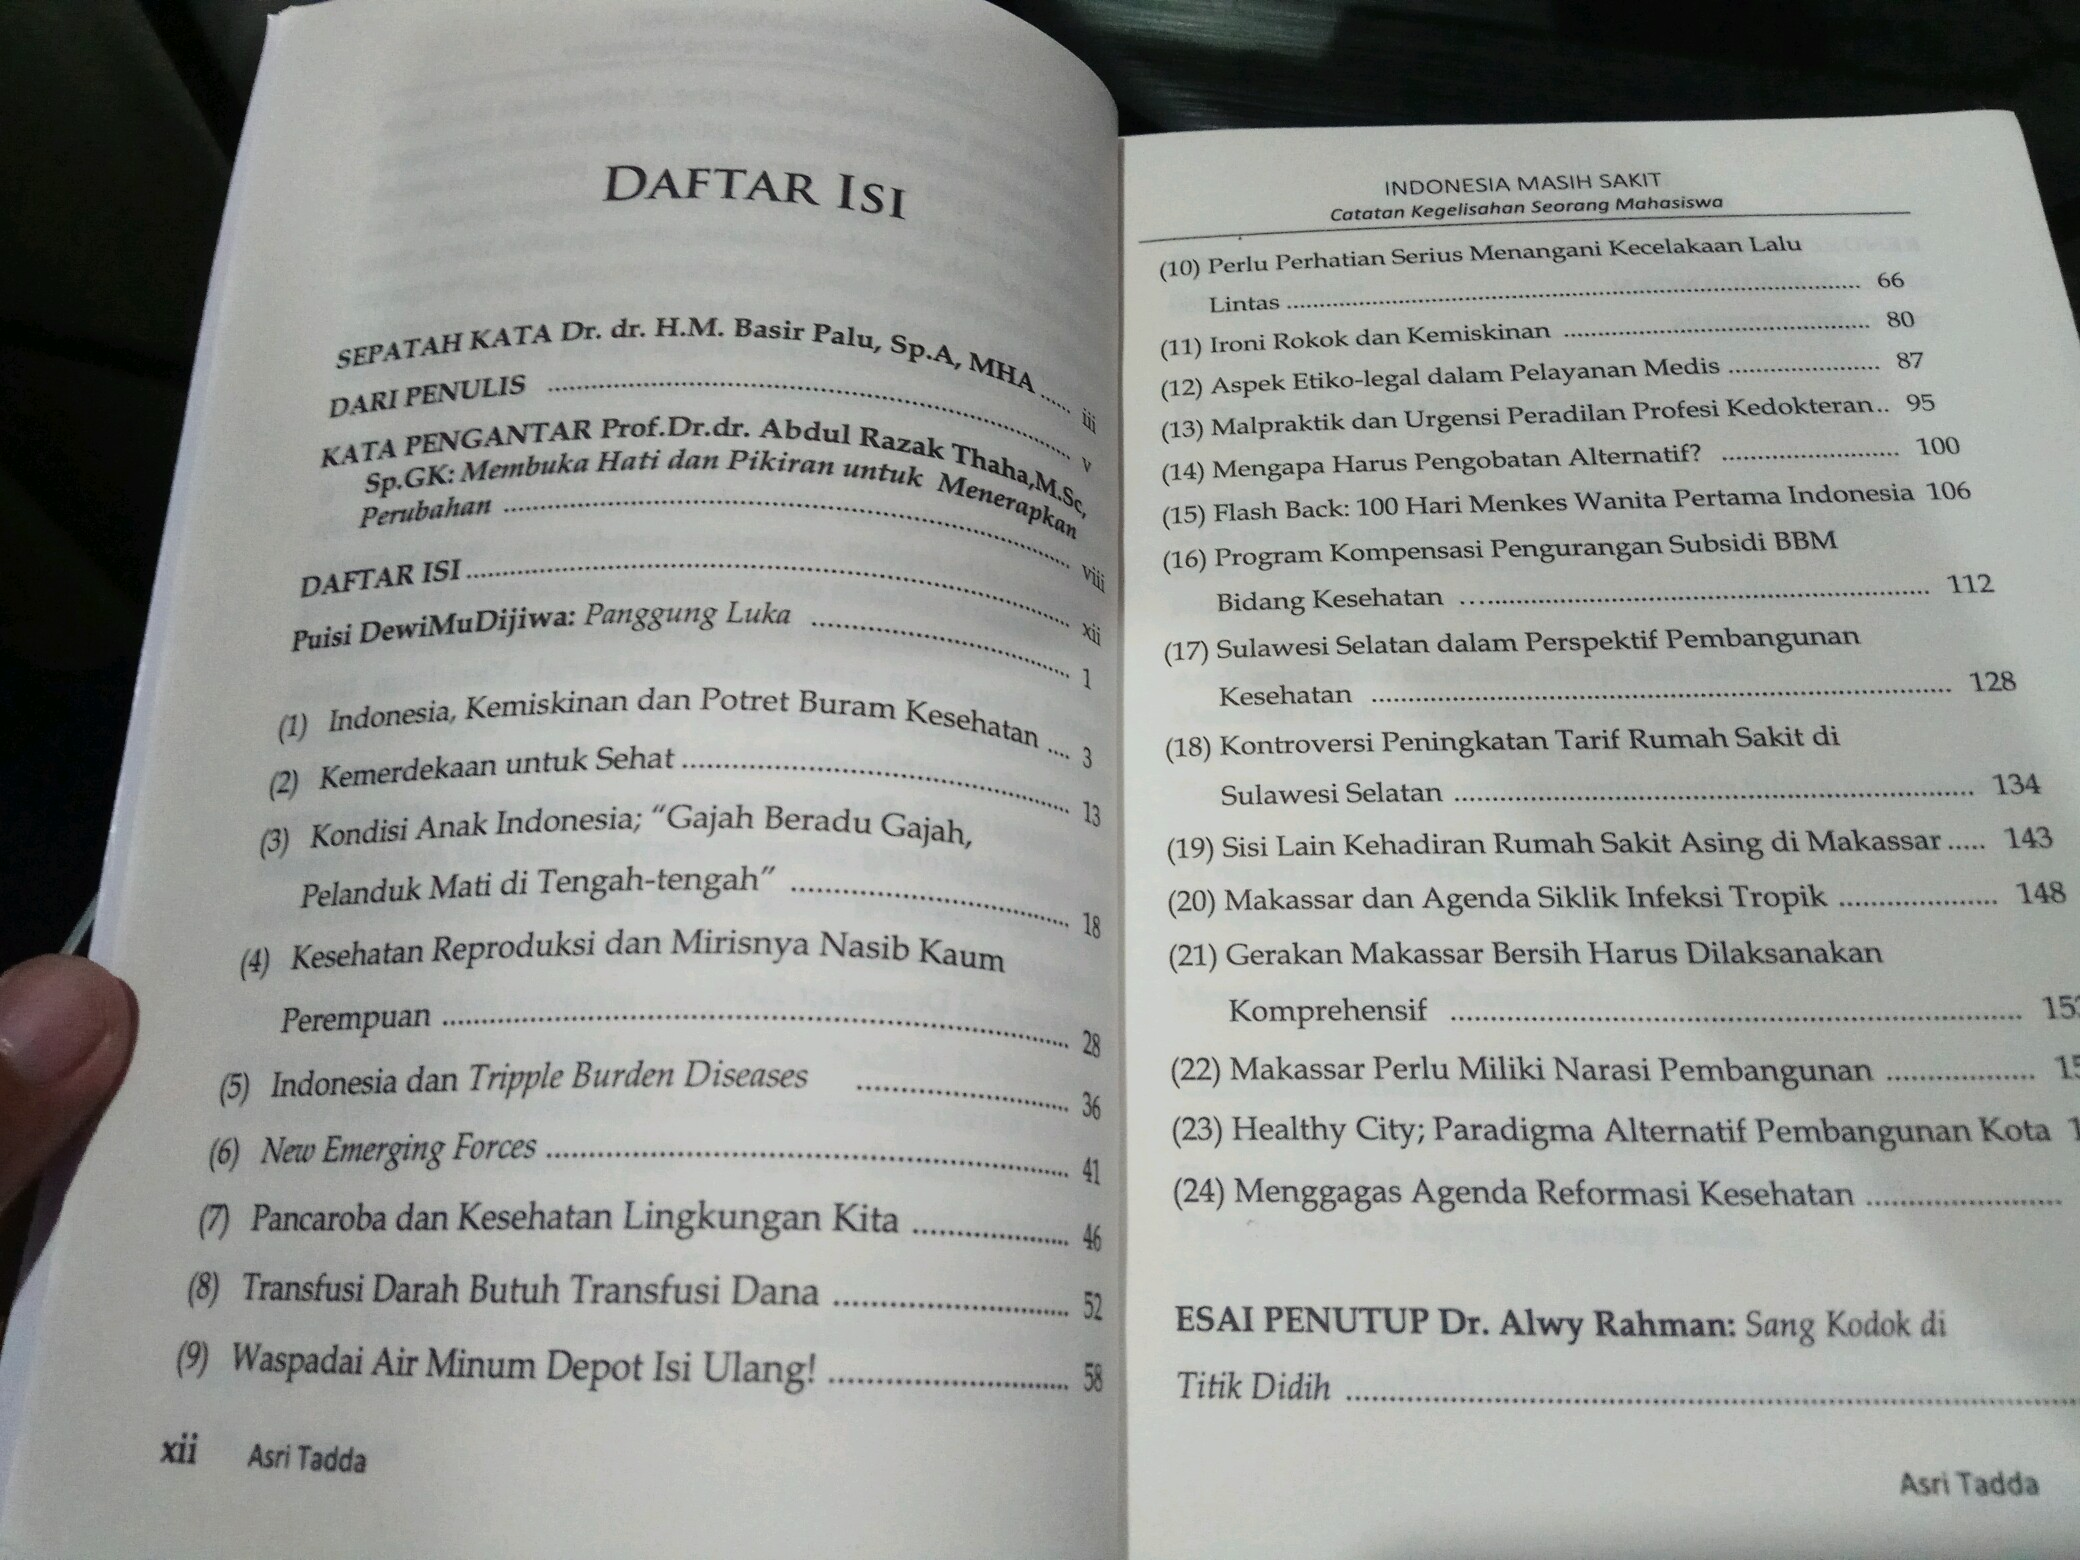 Daftar Isi Buku Indonesia Masih Sakit karya Asri Tadda